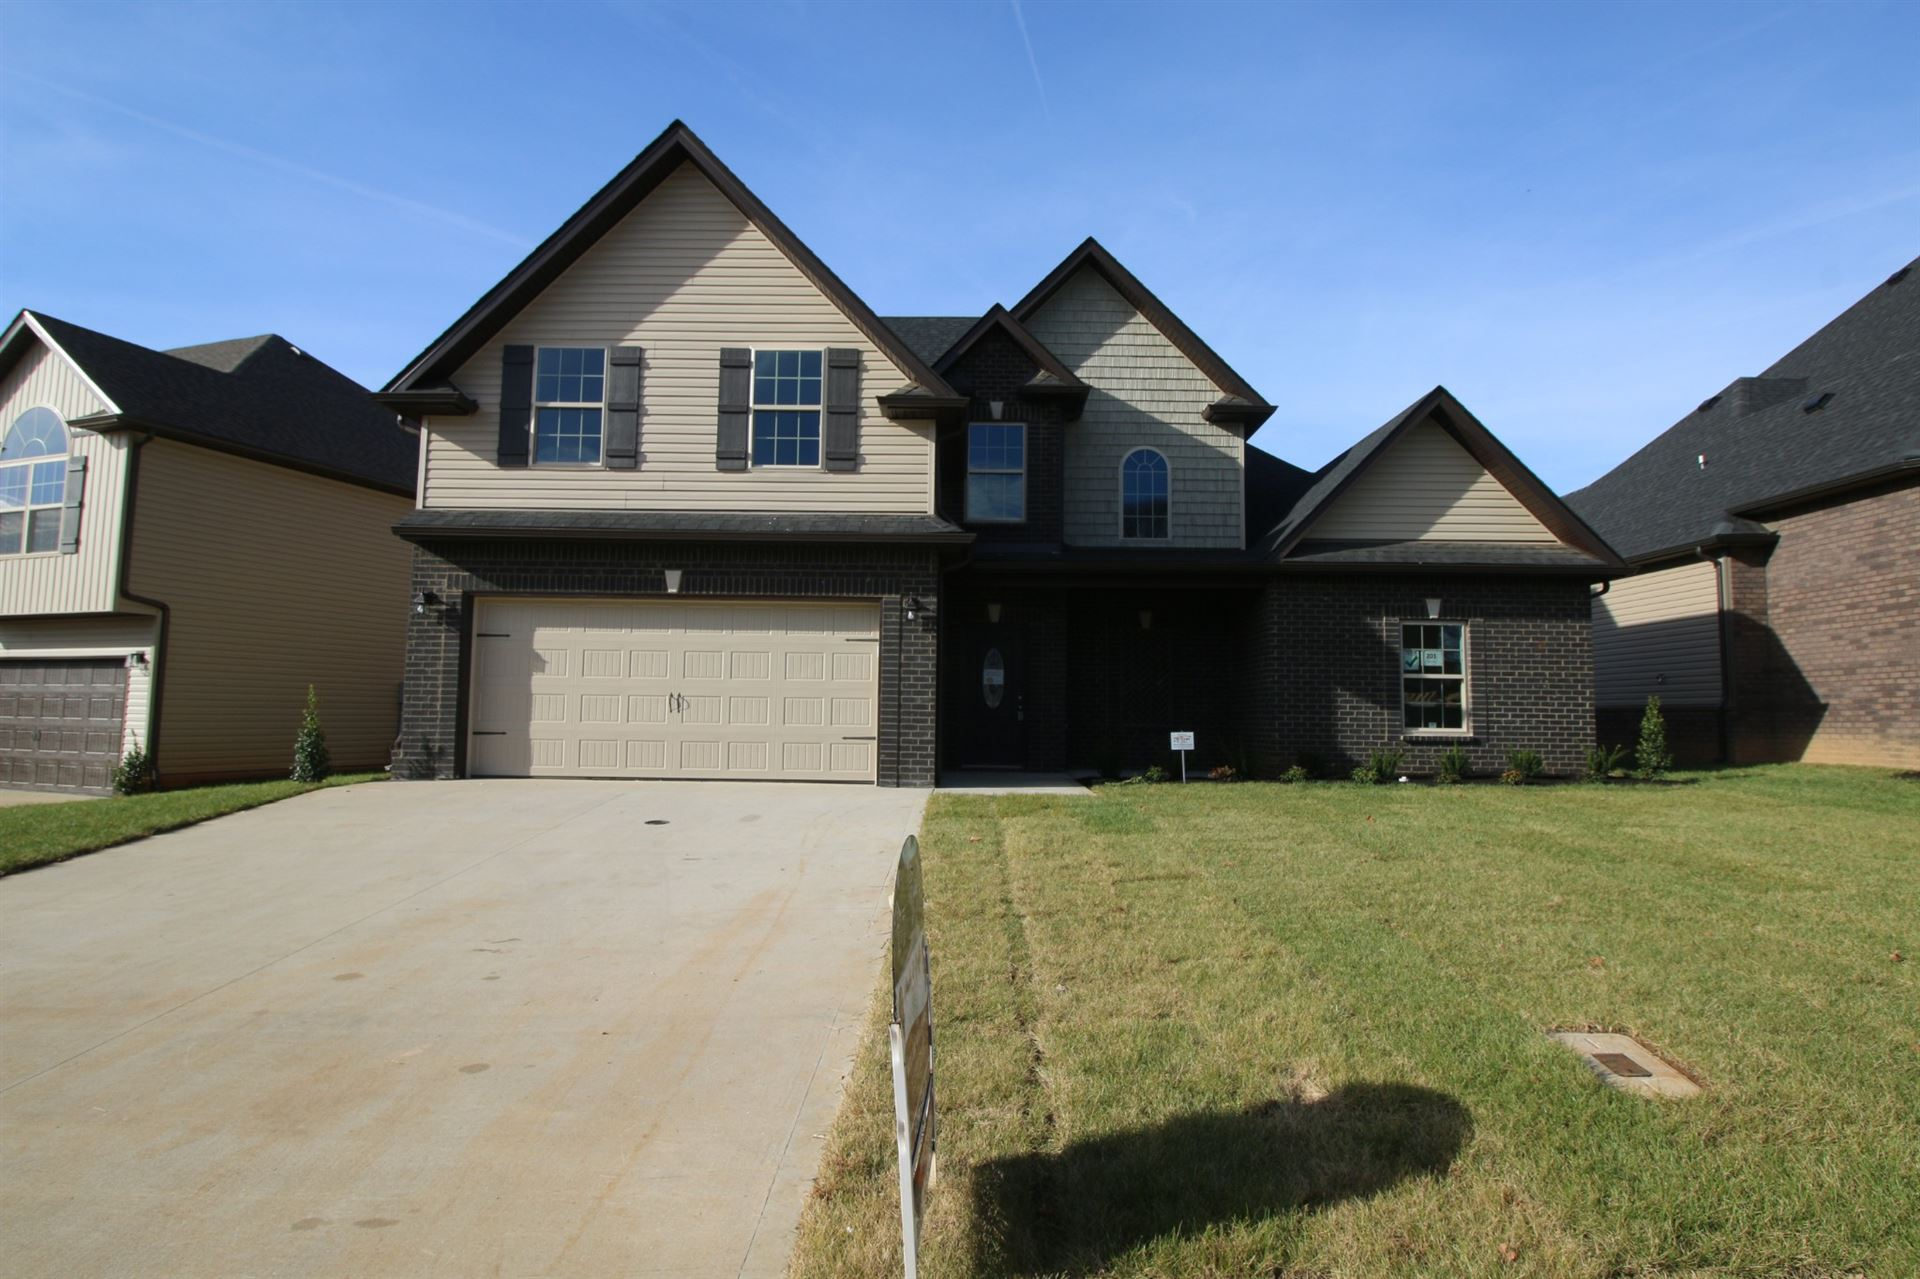 201 Mills Creek, Clarksville, TN 37042 - MLS#: 2284681